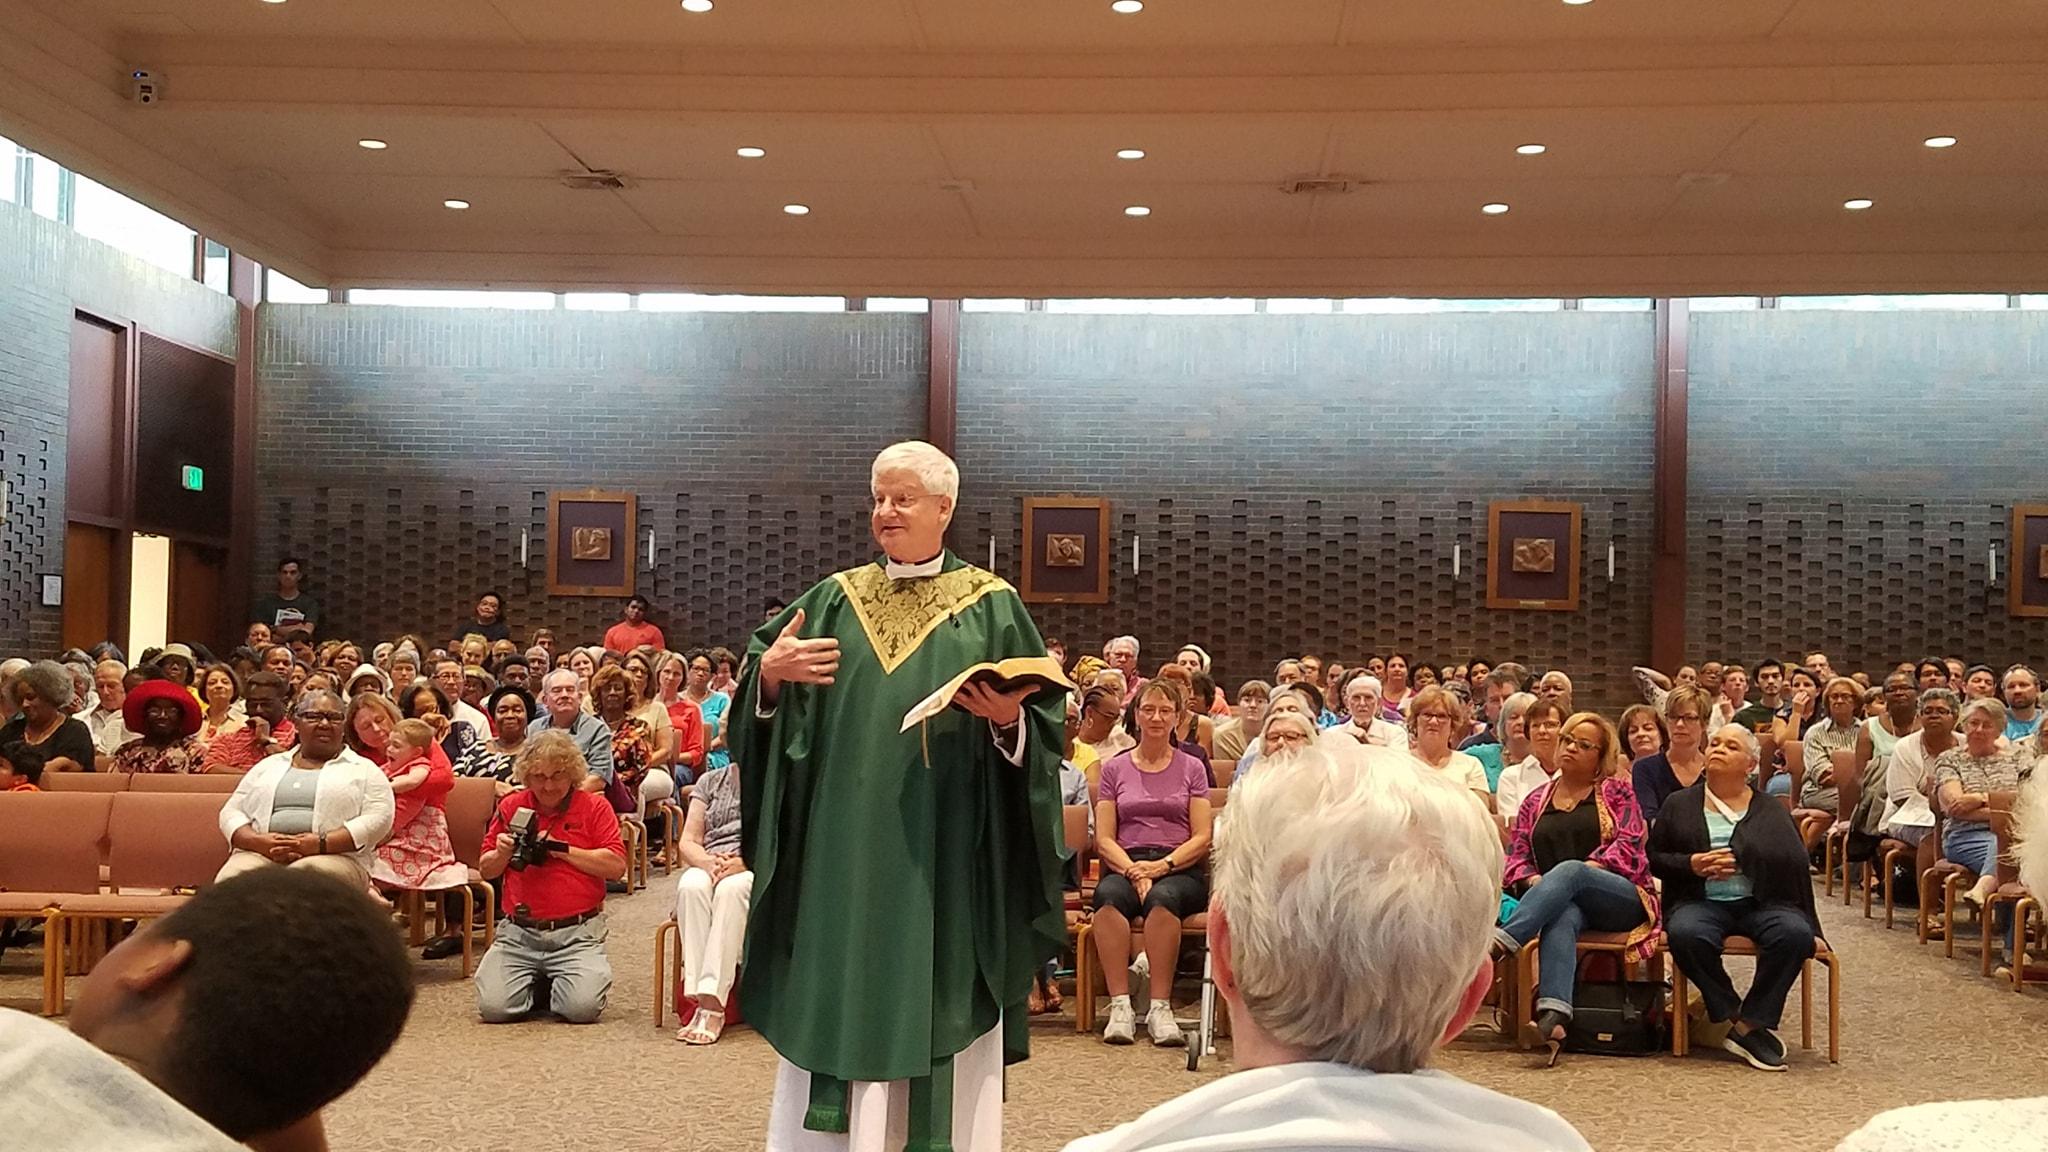 Fr. Rich preaching/teaching at St. John's